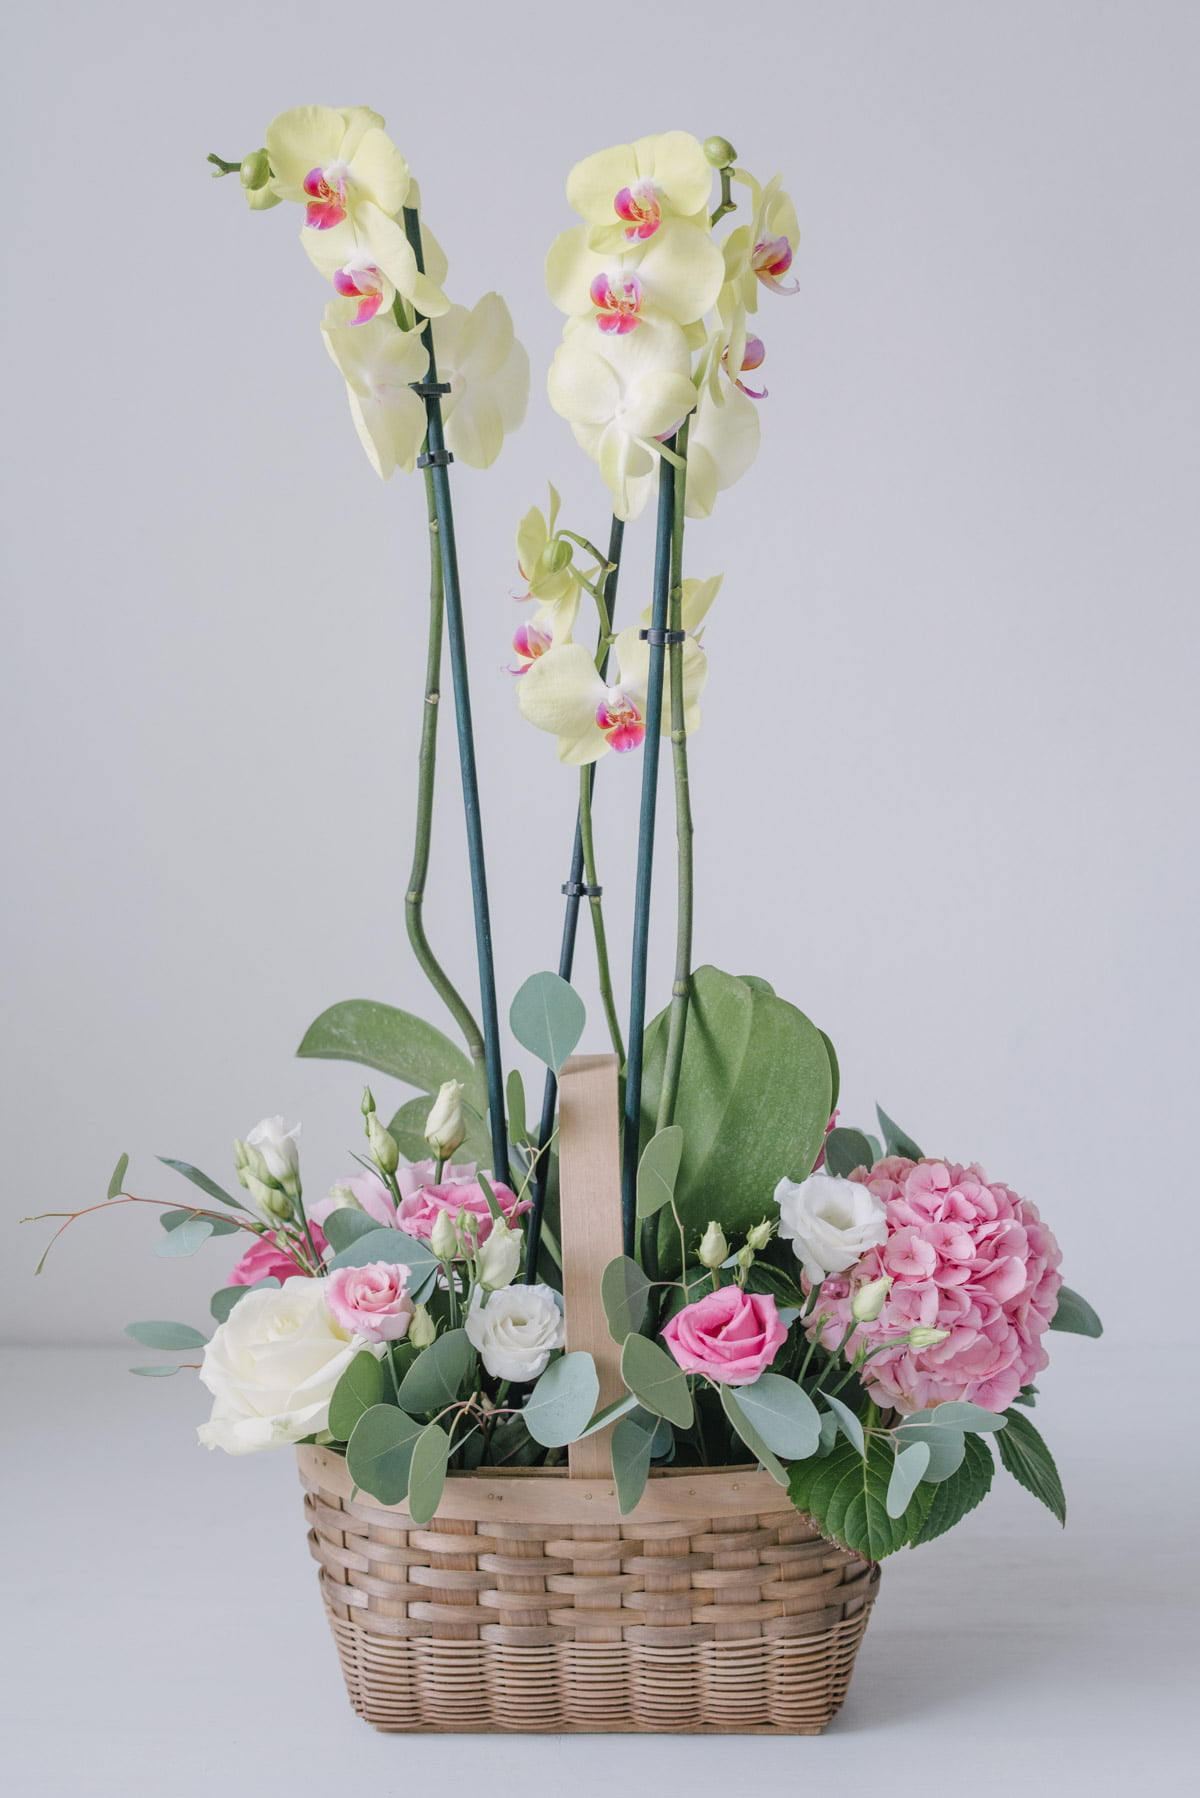 Aranjament Floral In Cos Cu Orhidee La Ghiveci